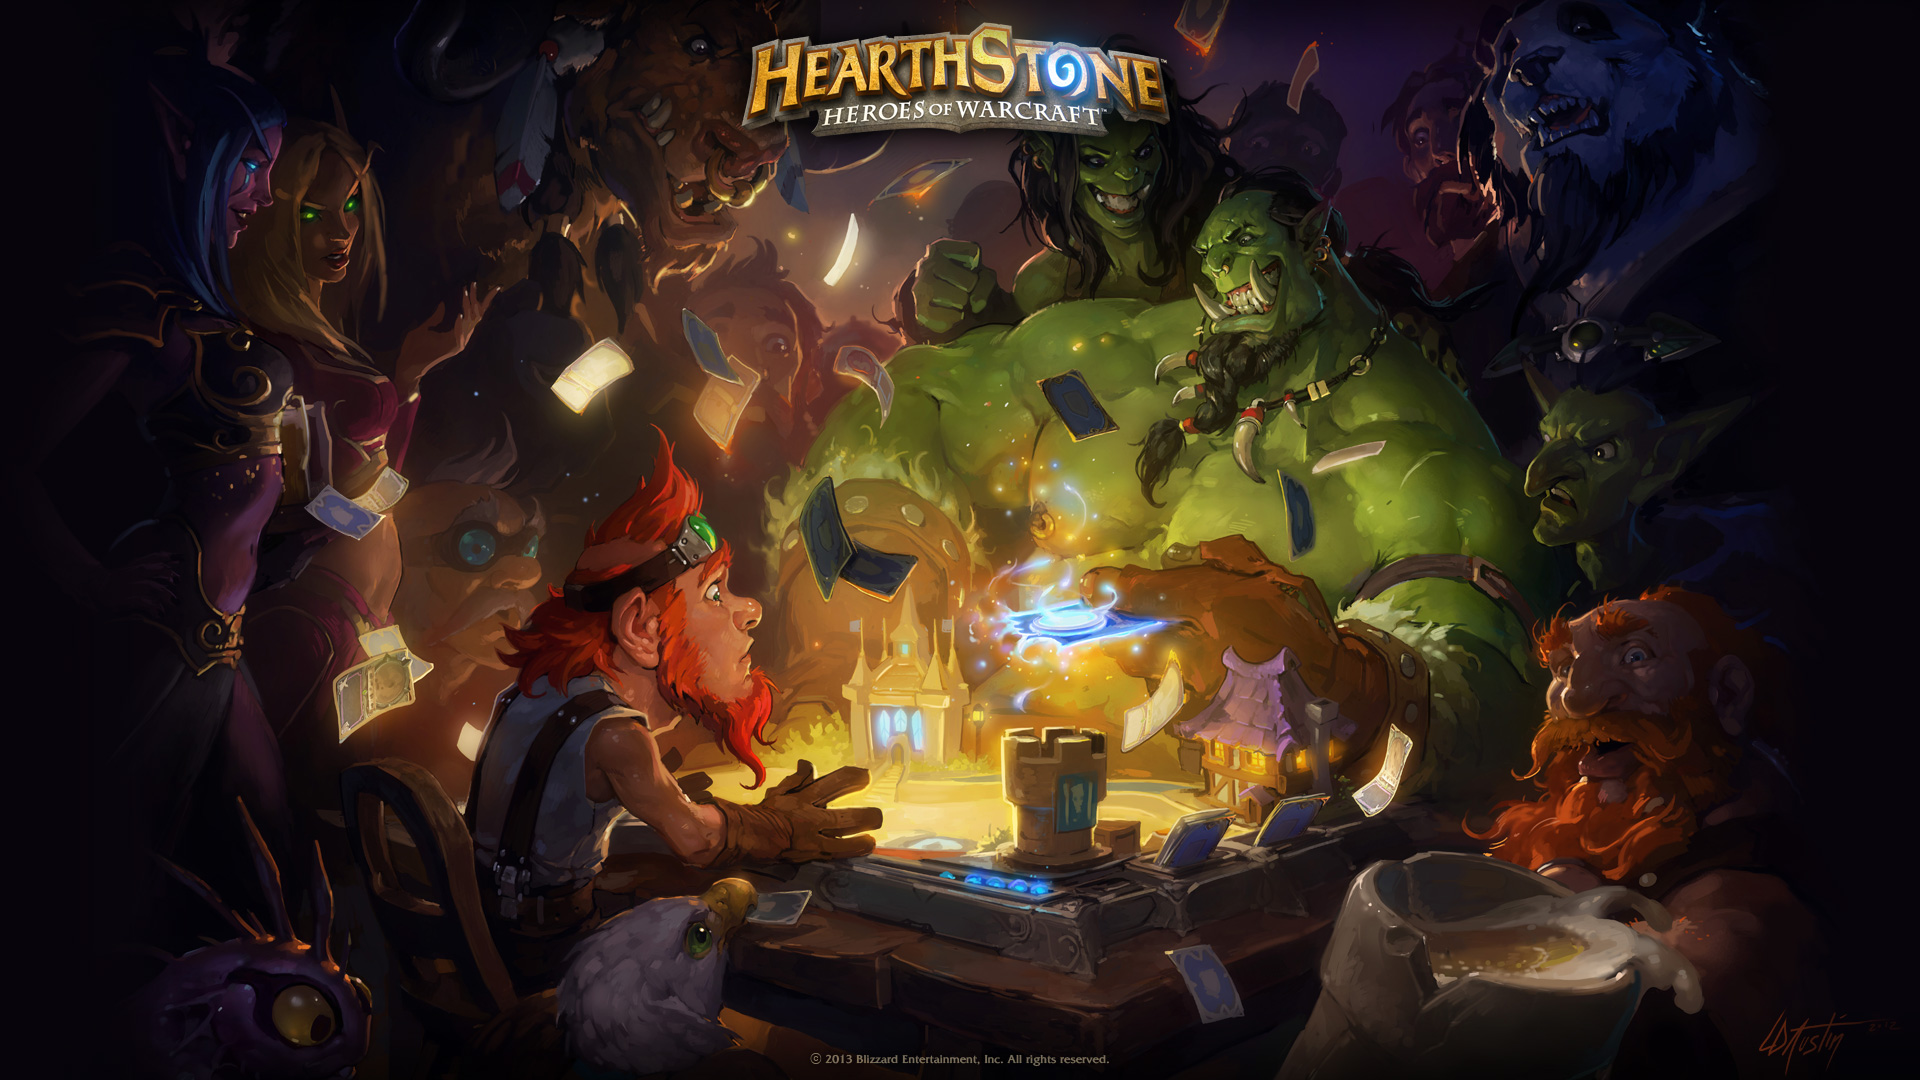 Hearthstone Heroes of Warcraft wallpaper 1